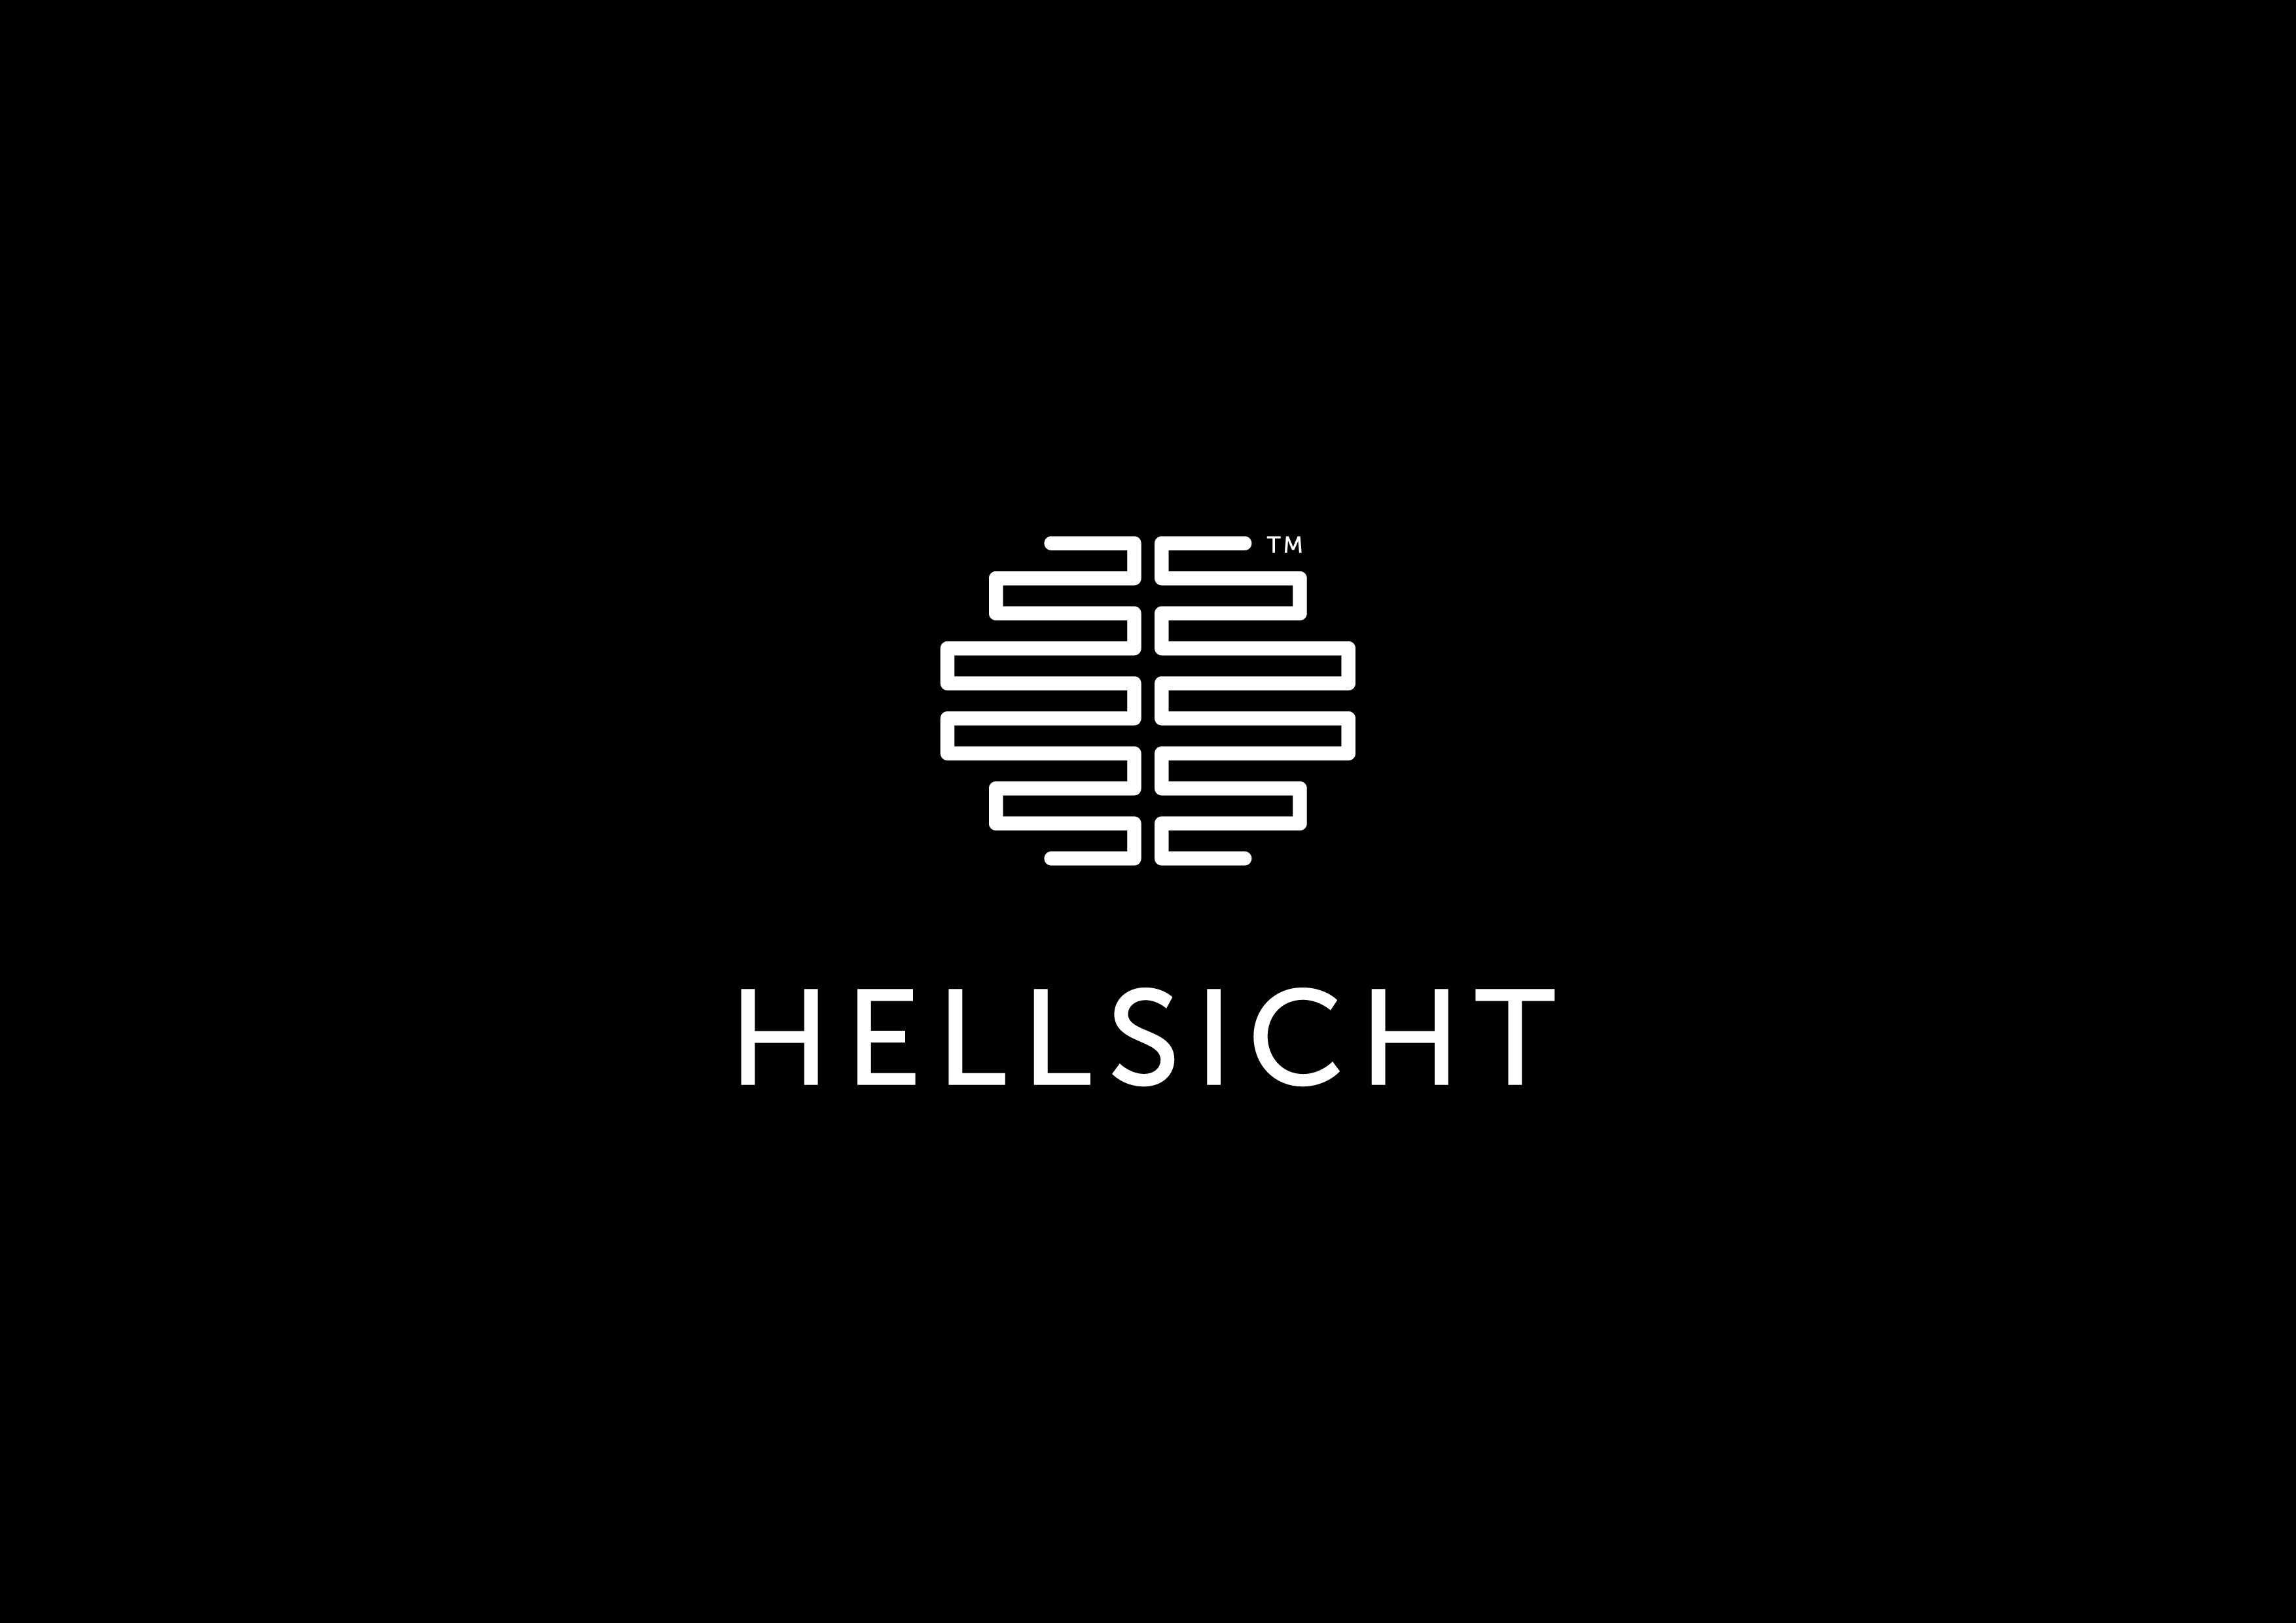 Hellsicht Logo Design